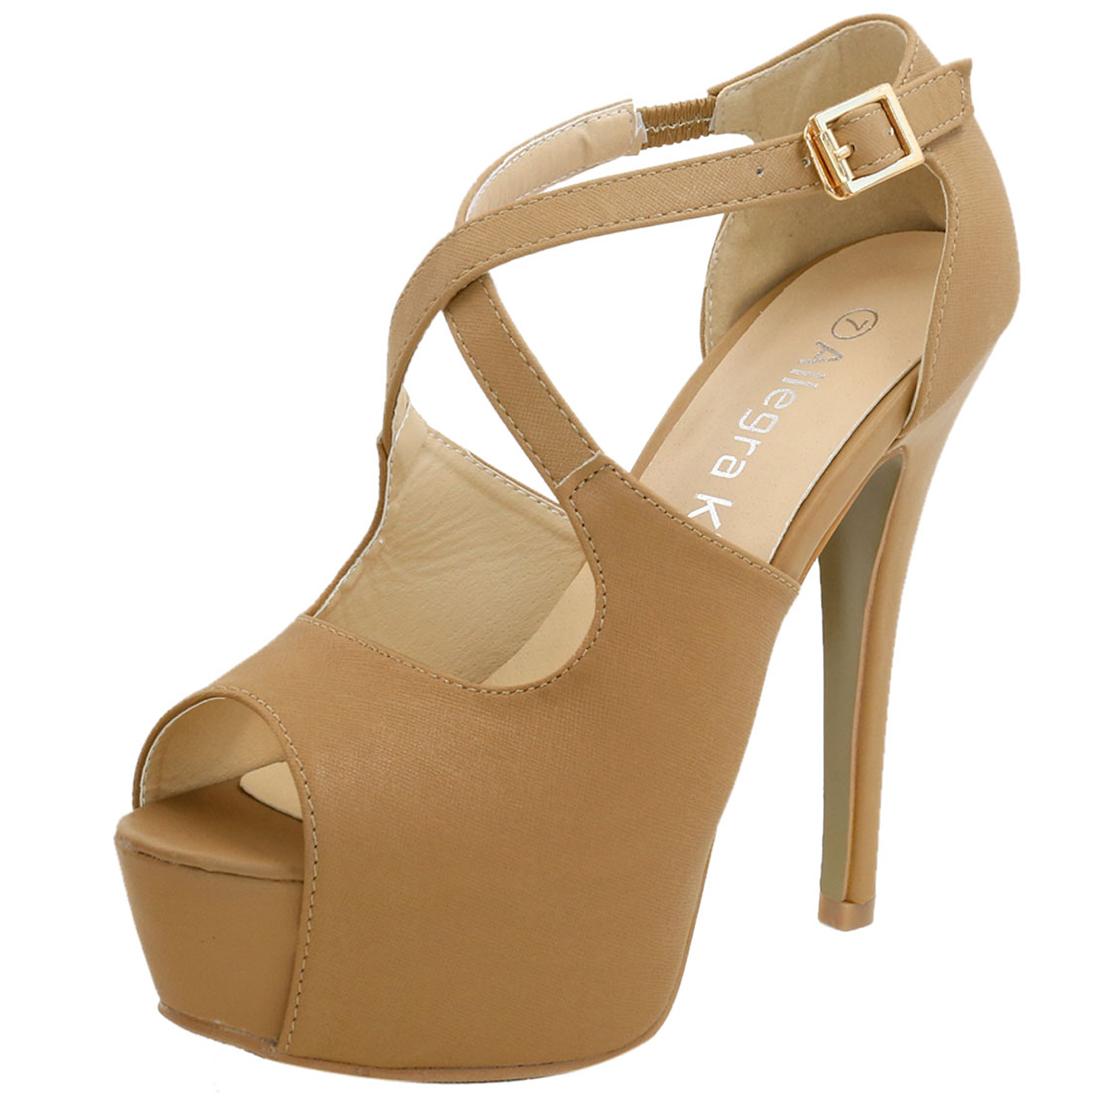 Woman Peep Toe High Heel Crisscross Straps Platform Sandals Tan US 9